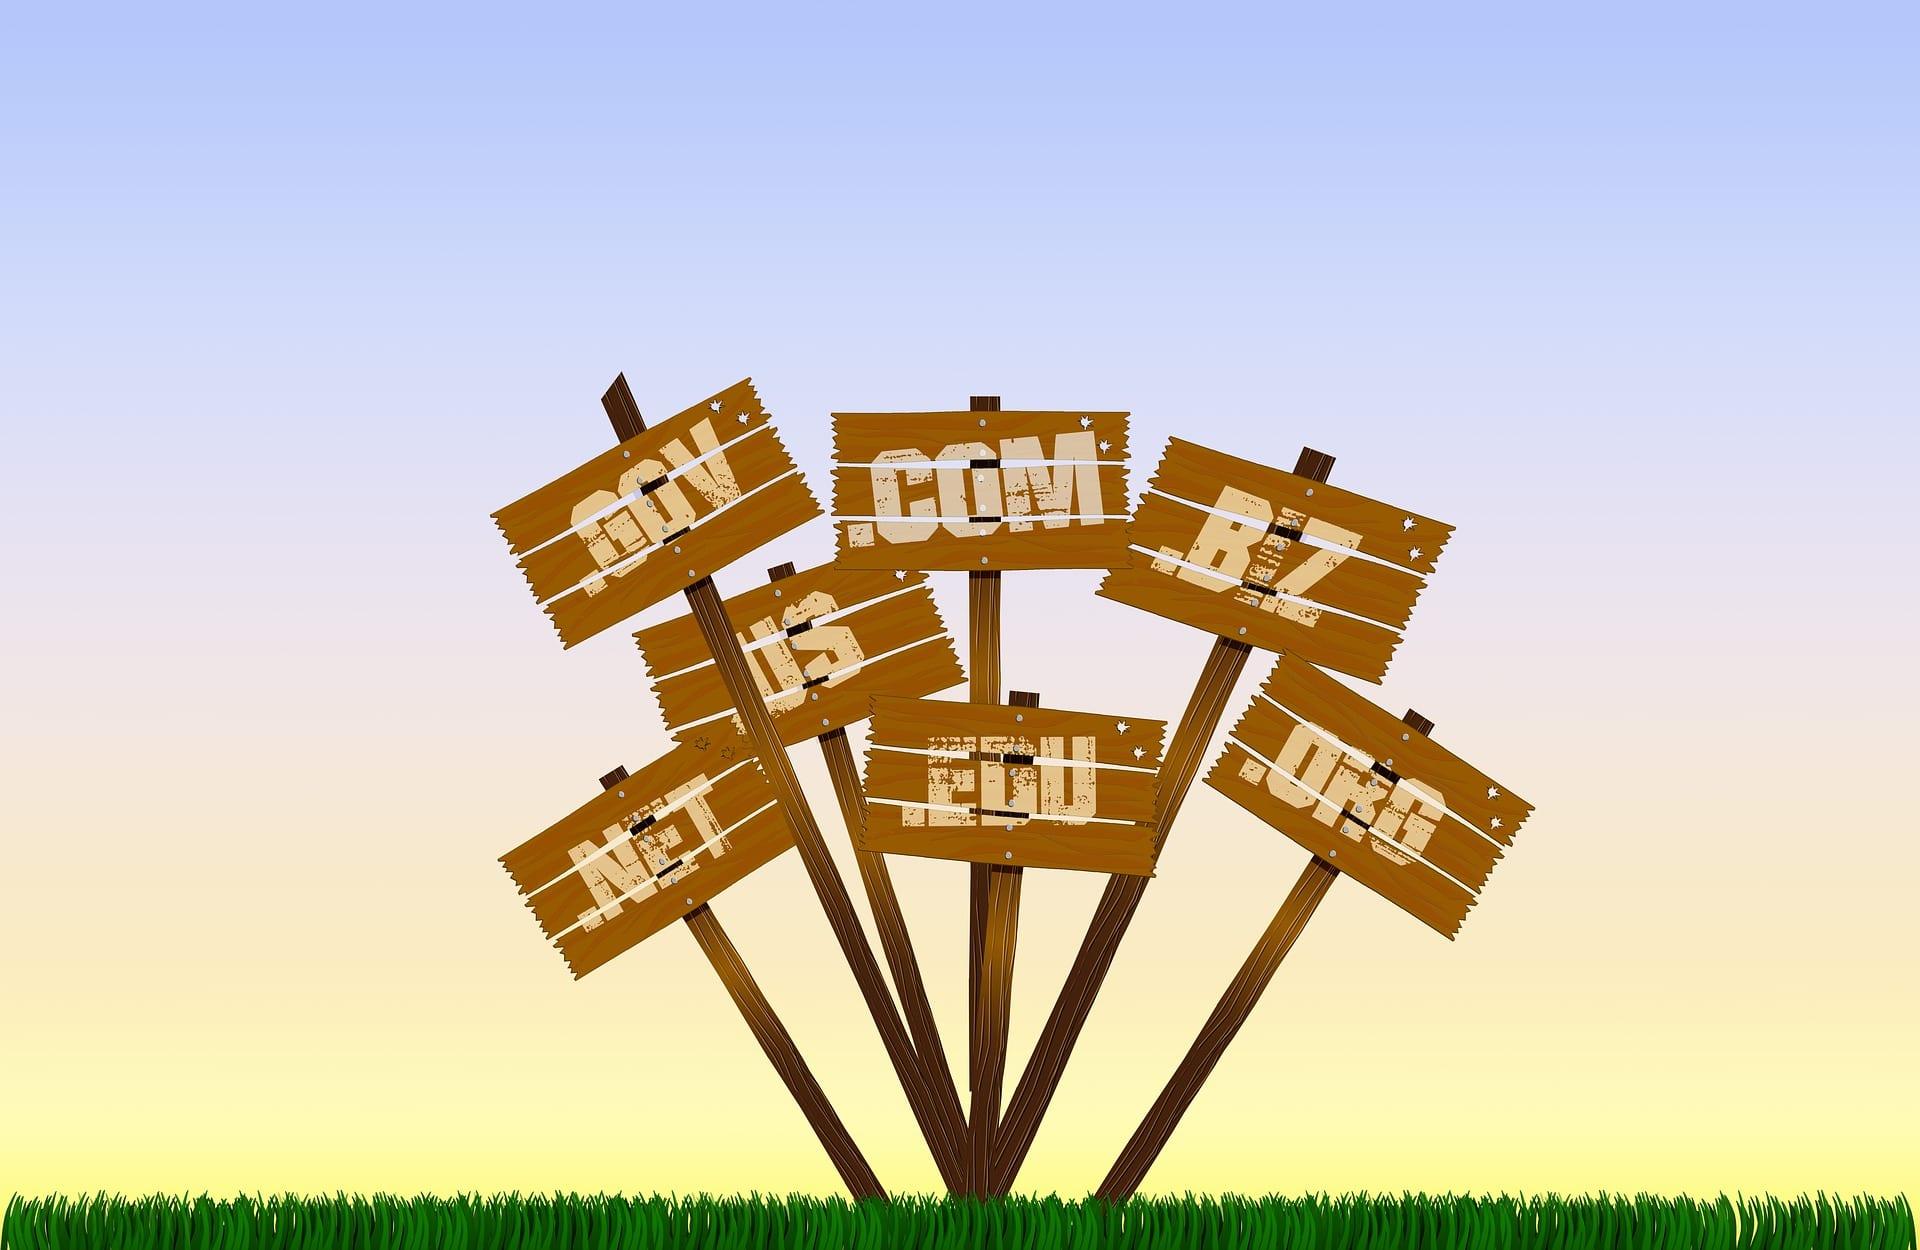 Domainendungen im Internet